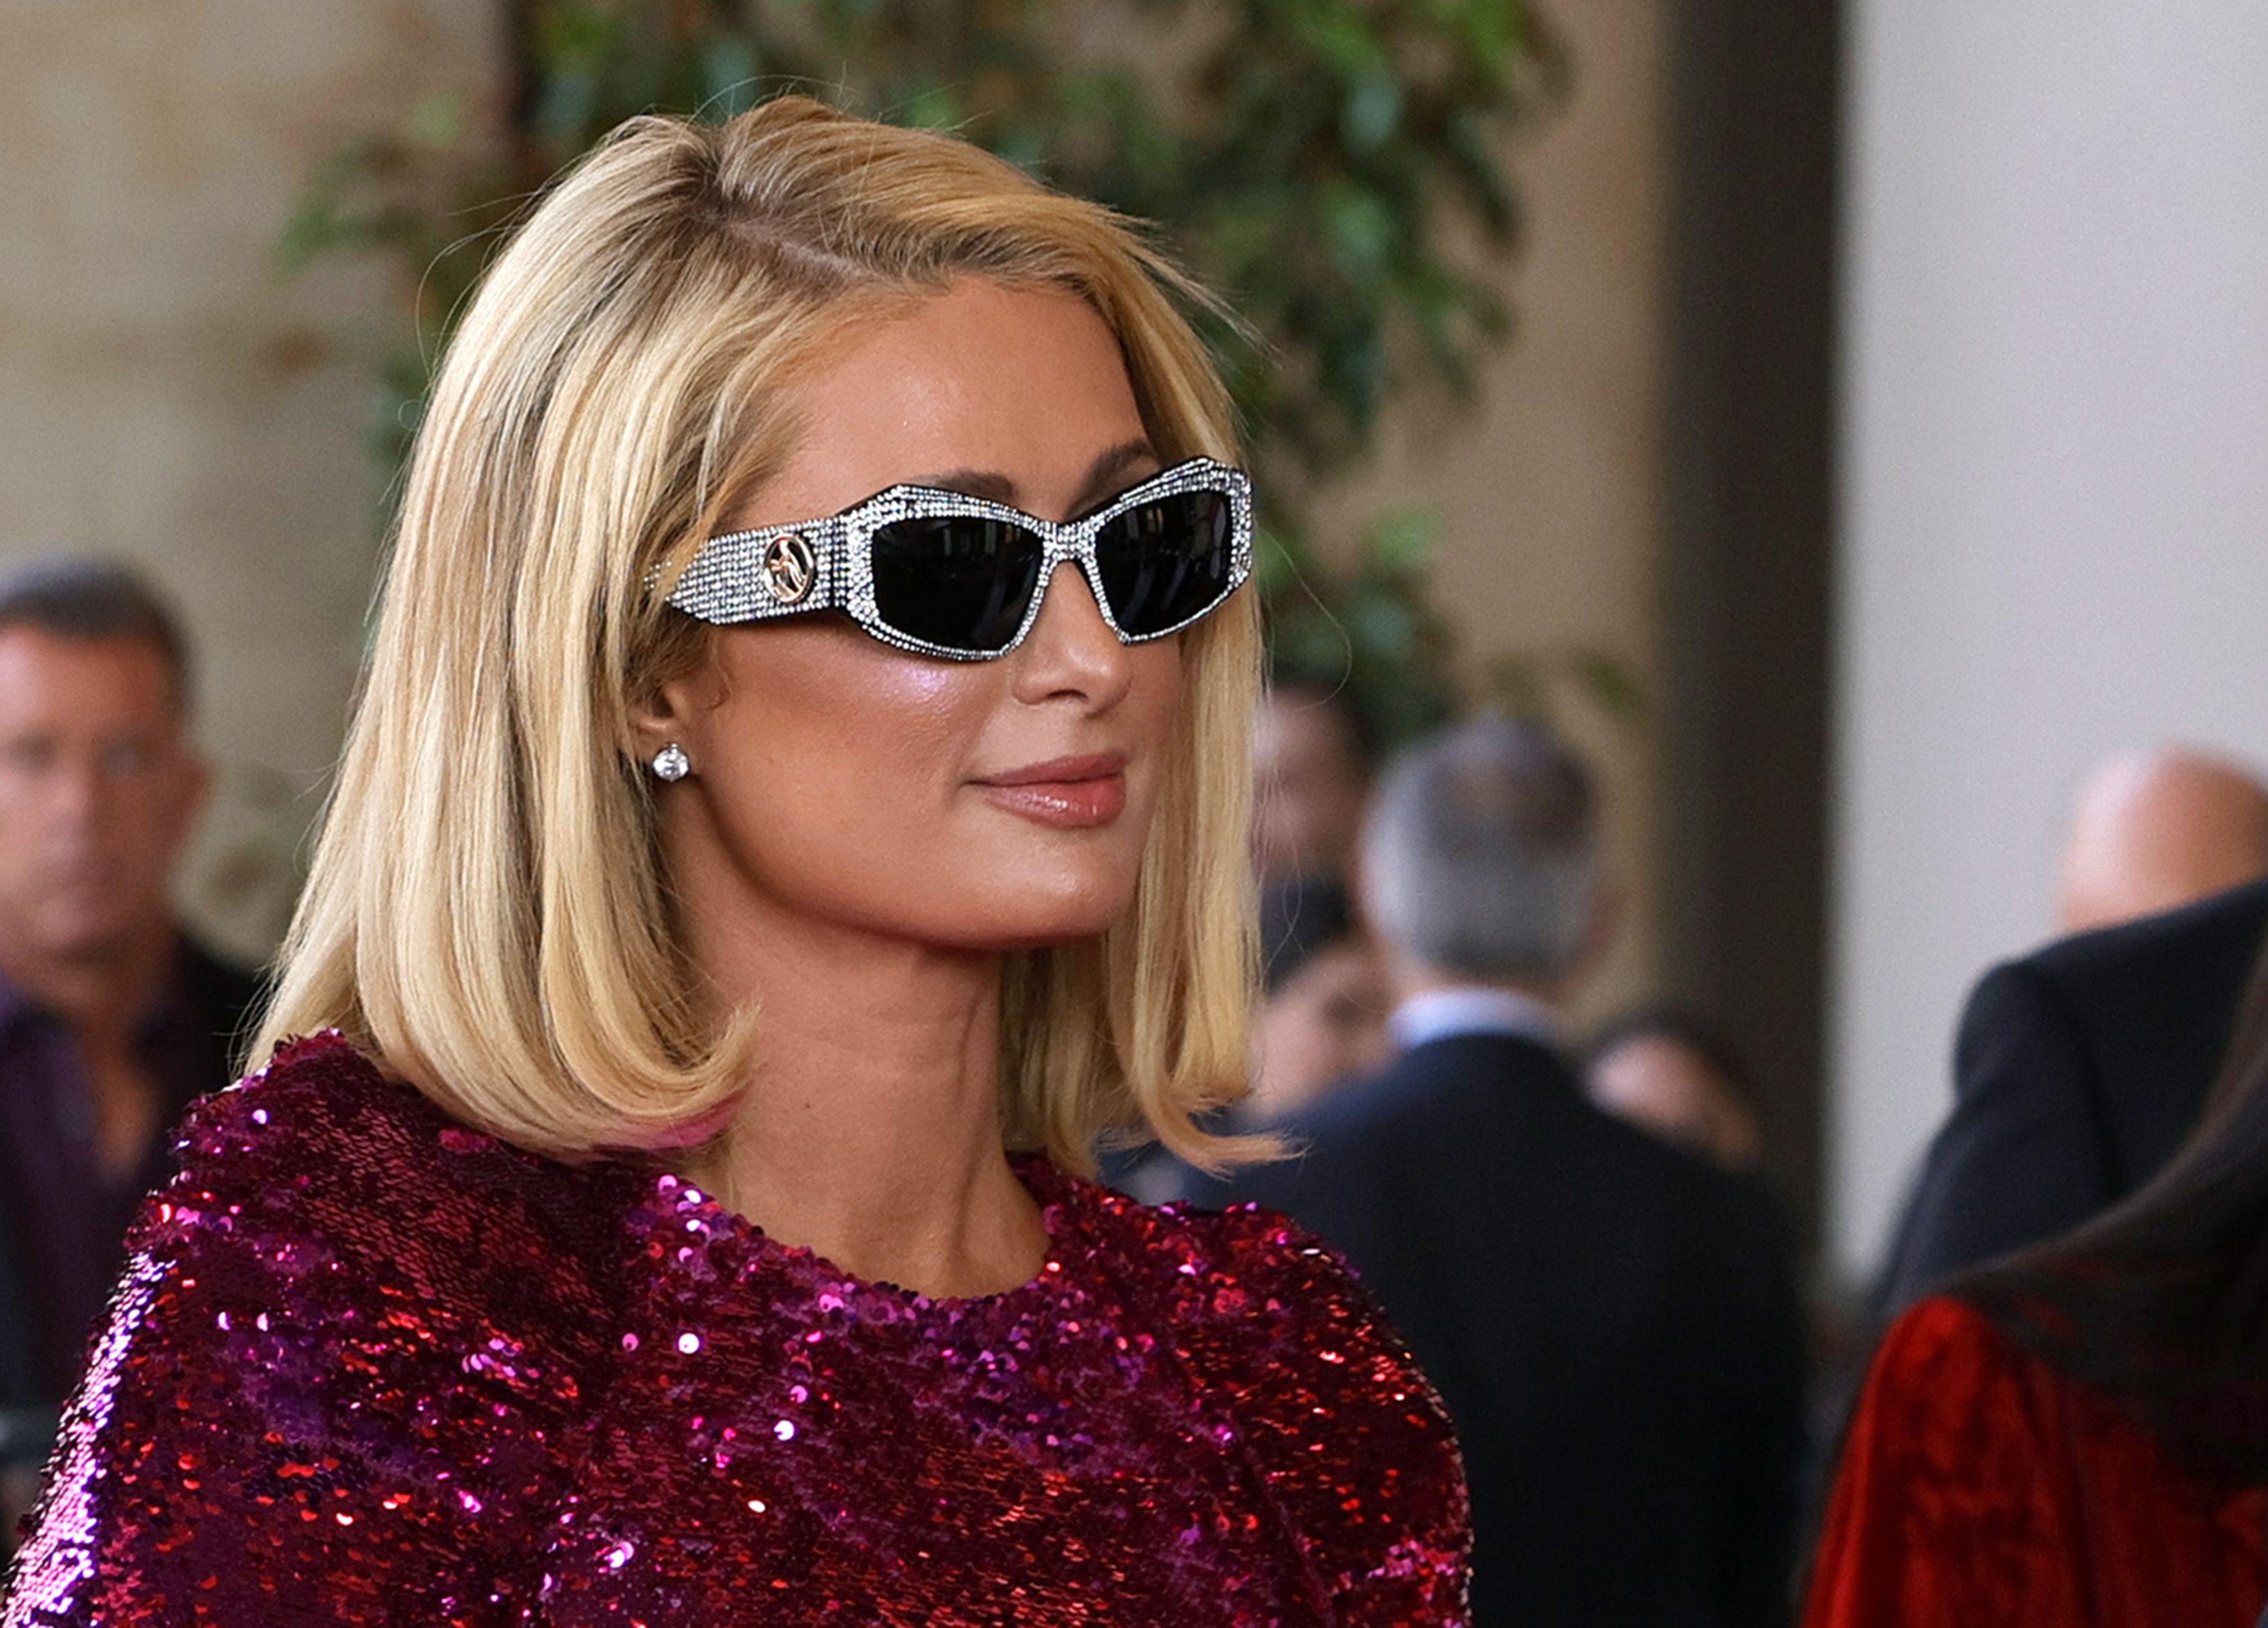 Why did Paris Hilton block Love Island's Chloe Burrows on Twitter?